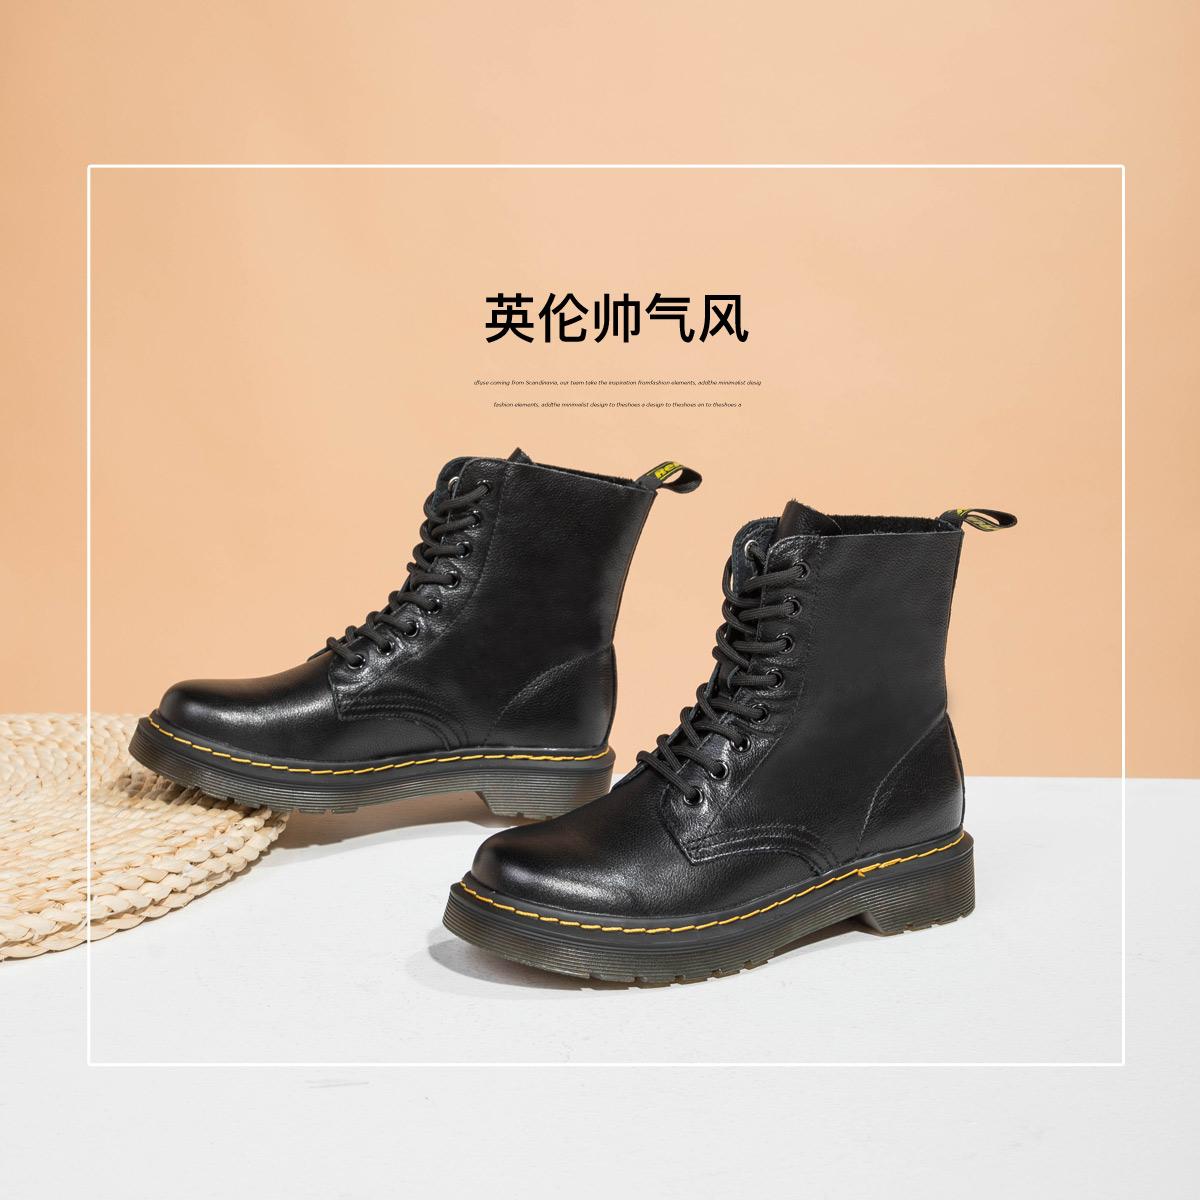 SS04116931 星期六时尚马丁靴秋冬新品休闲时尚商场同款短靴女